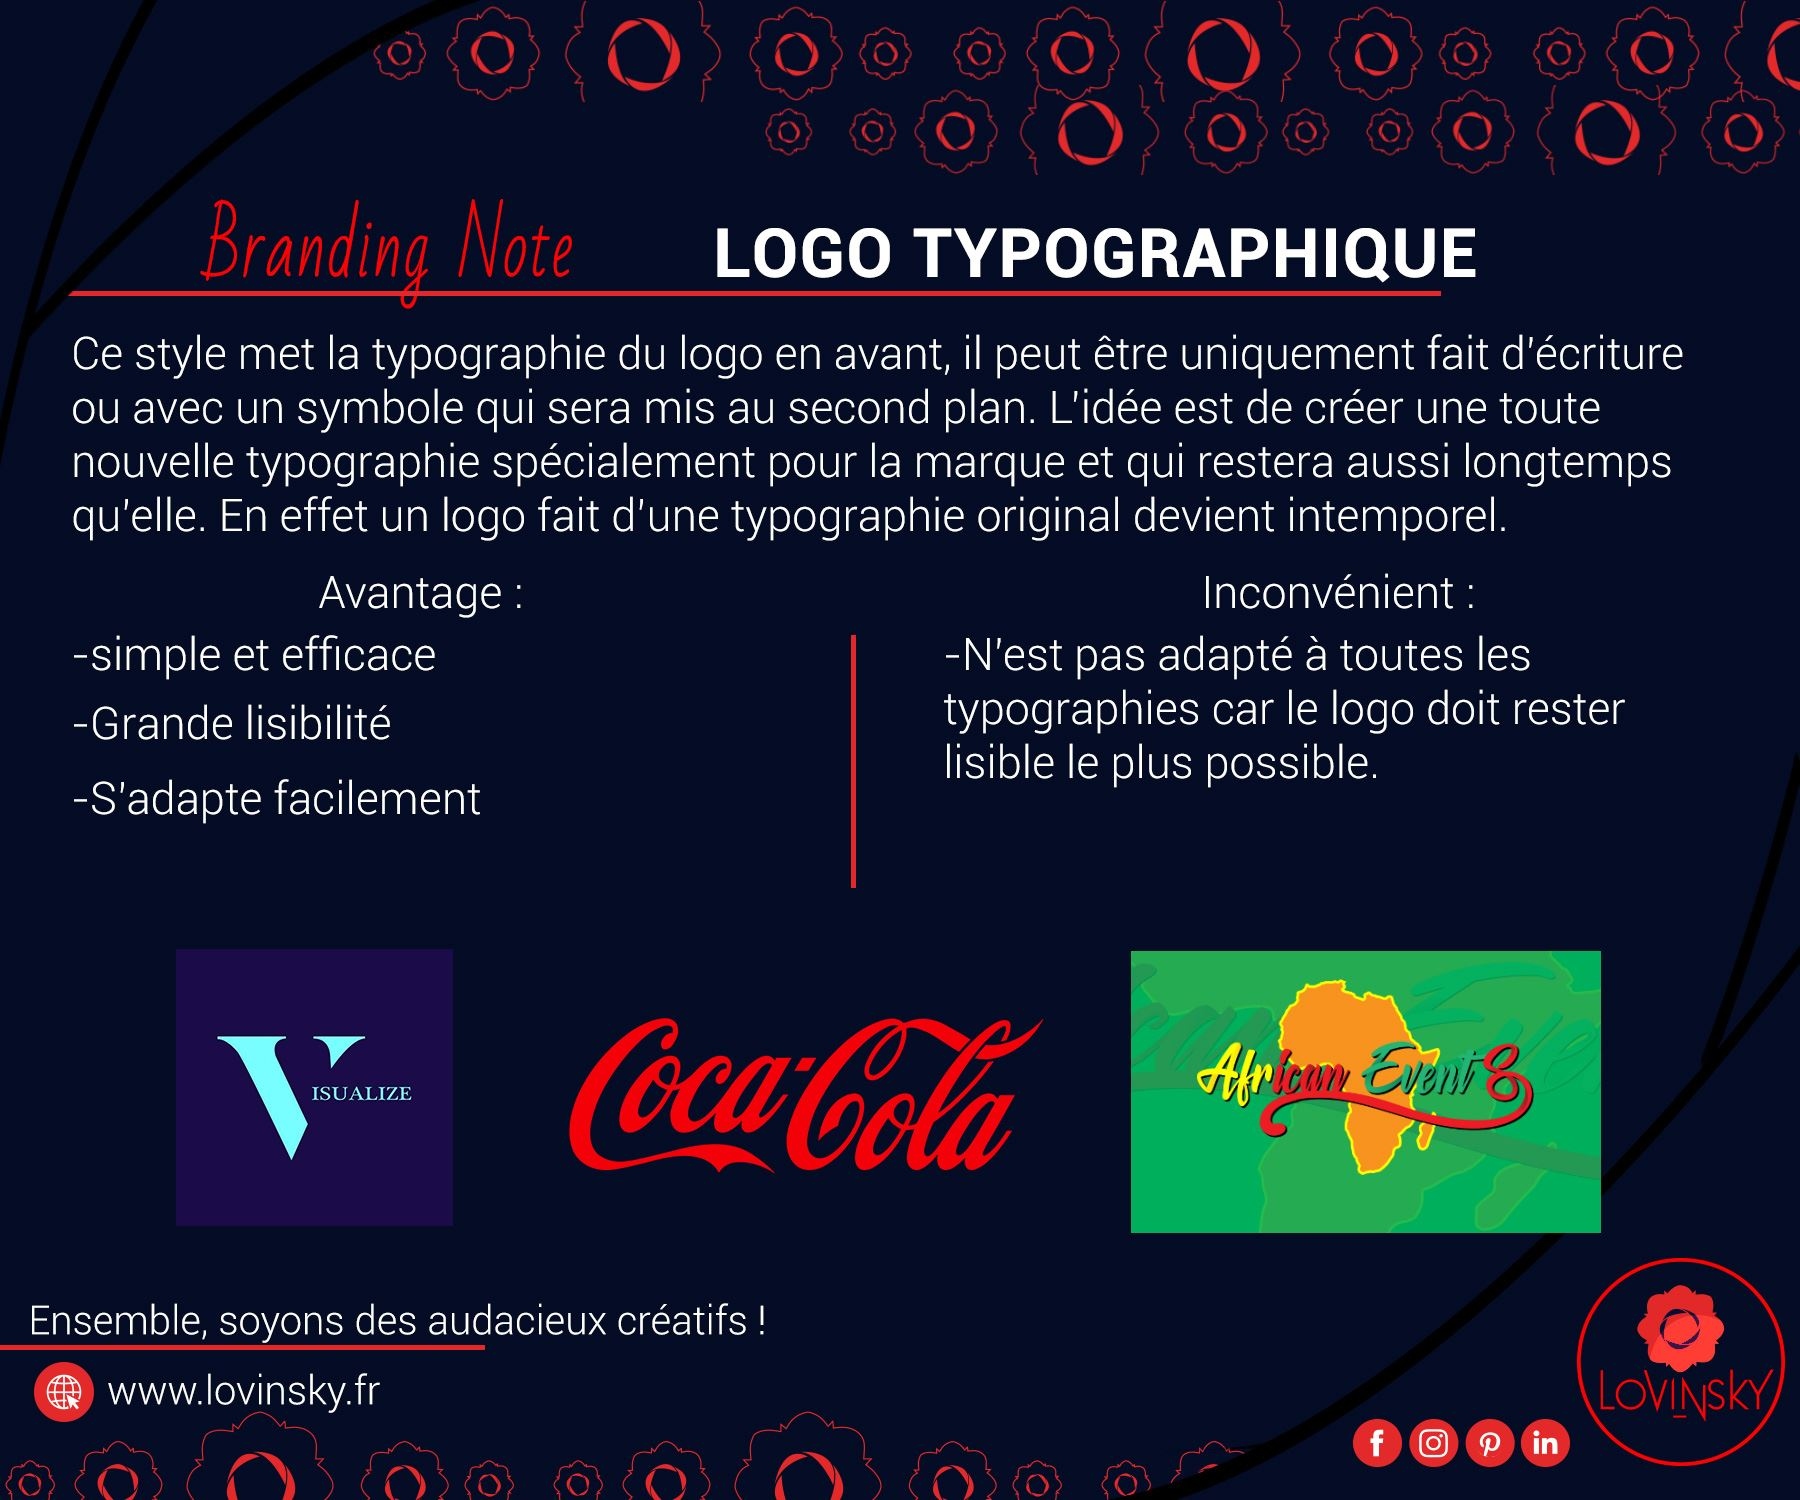 logo-typographique lovinsky graphiste webdesigner freelance indépendant nantes 44